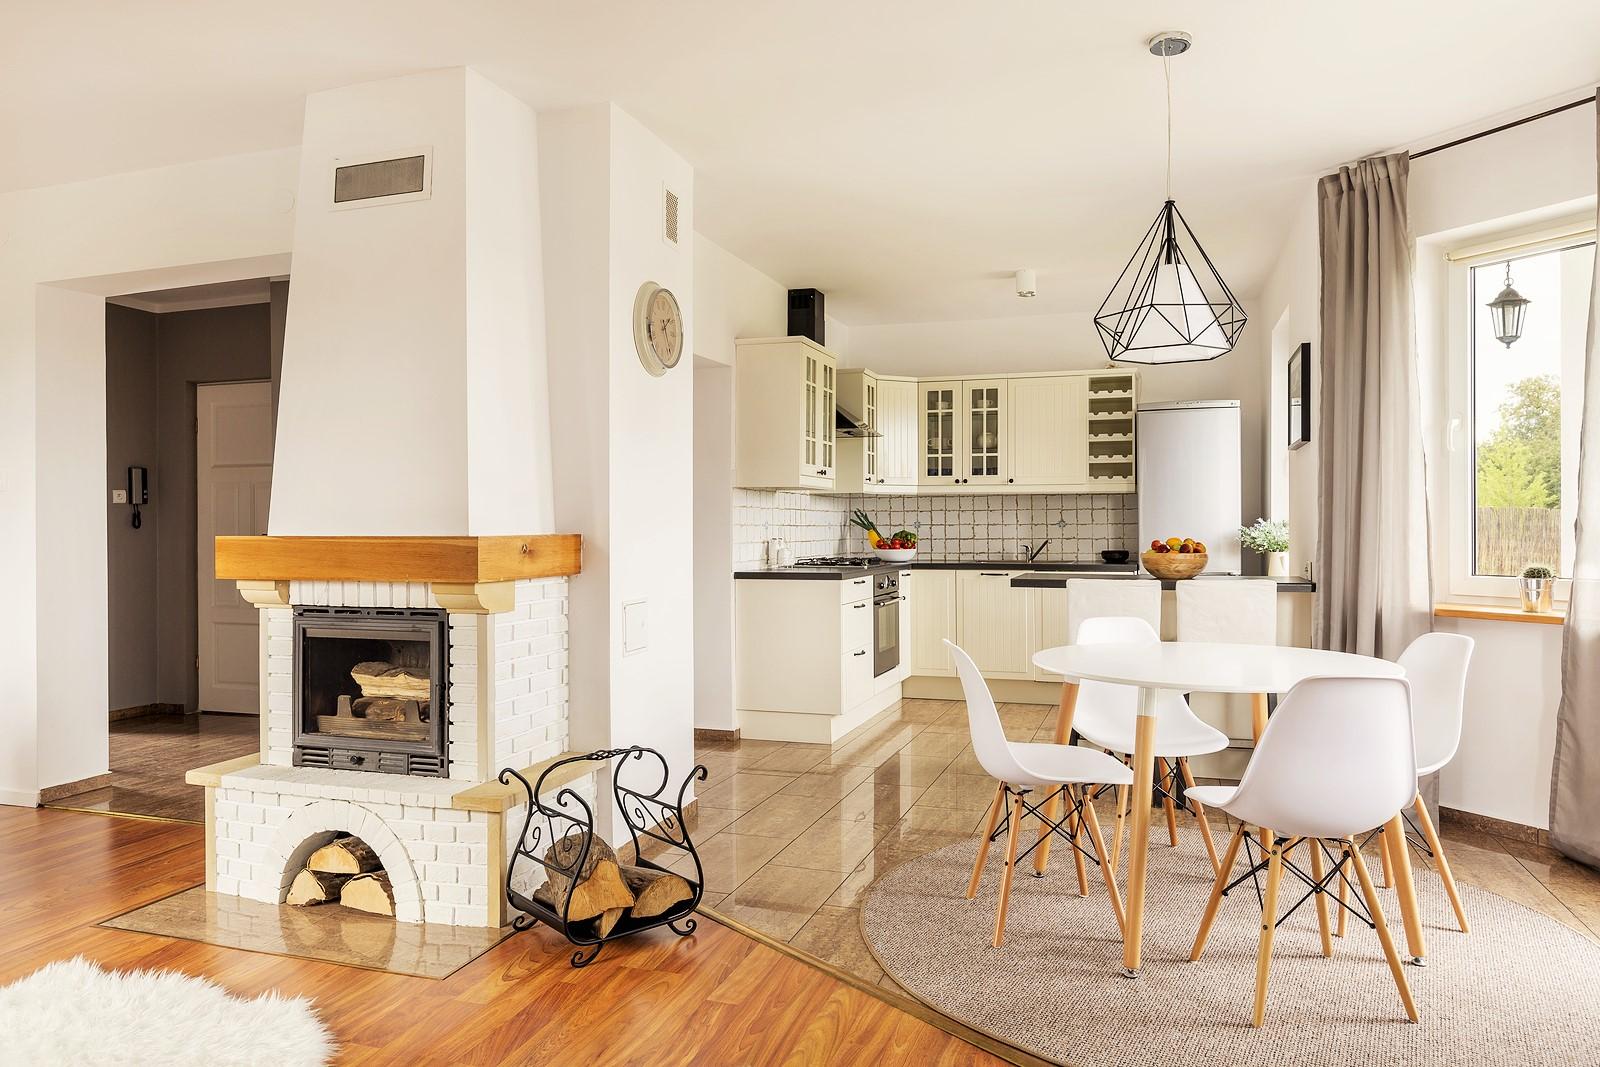 mieszkanie w stylu hygge jak urz dzi modn skandynawsk kuchni. Black Bedroom Furniture Sets. Home Design Ideas